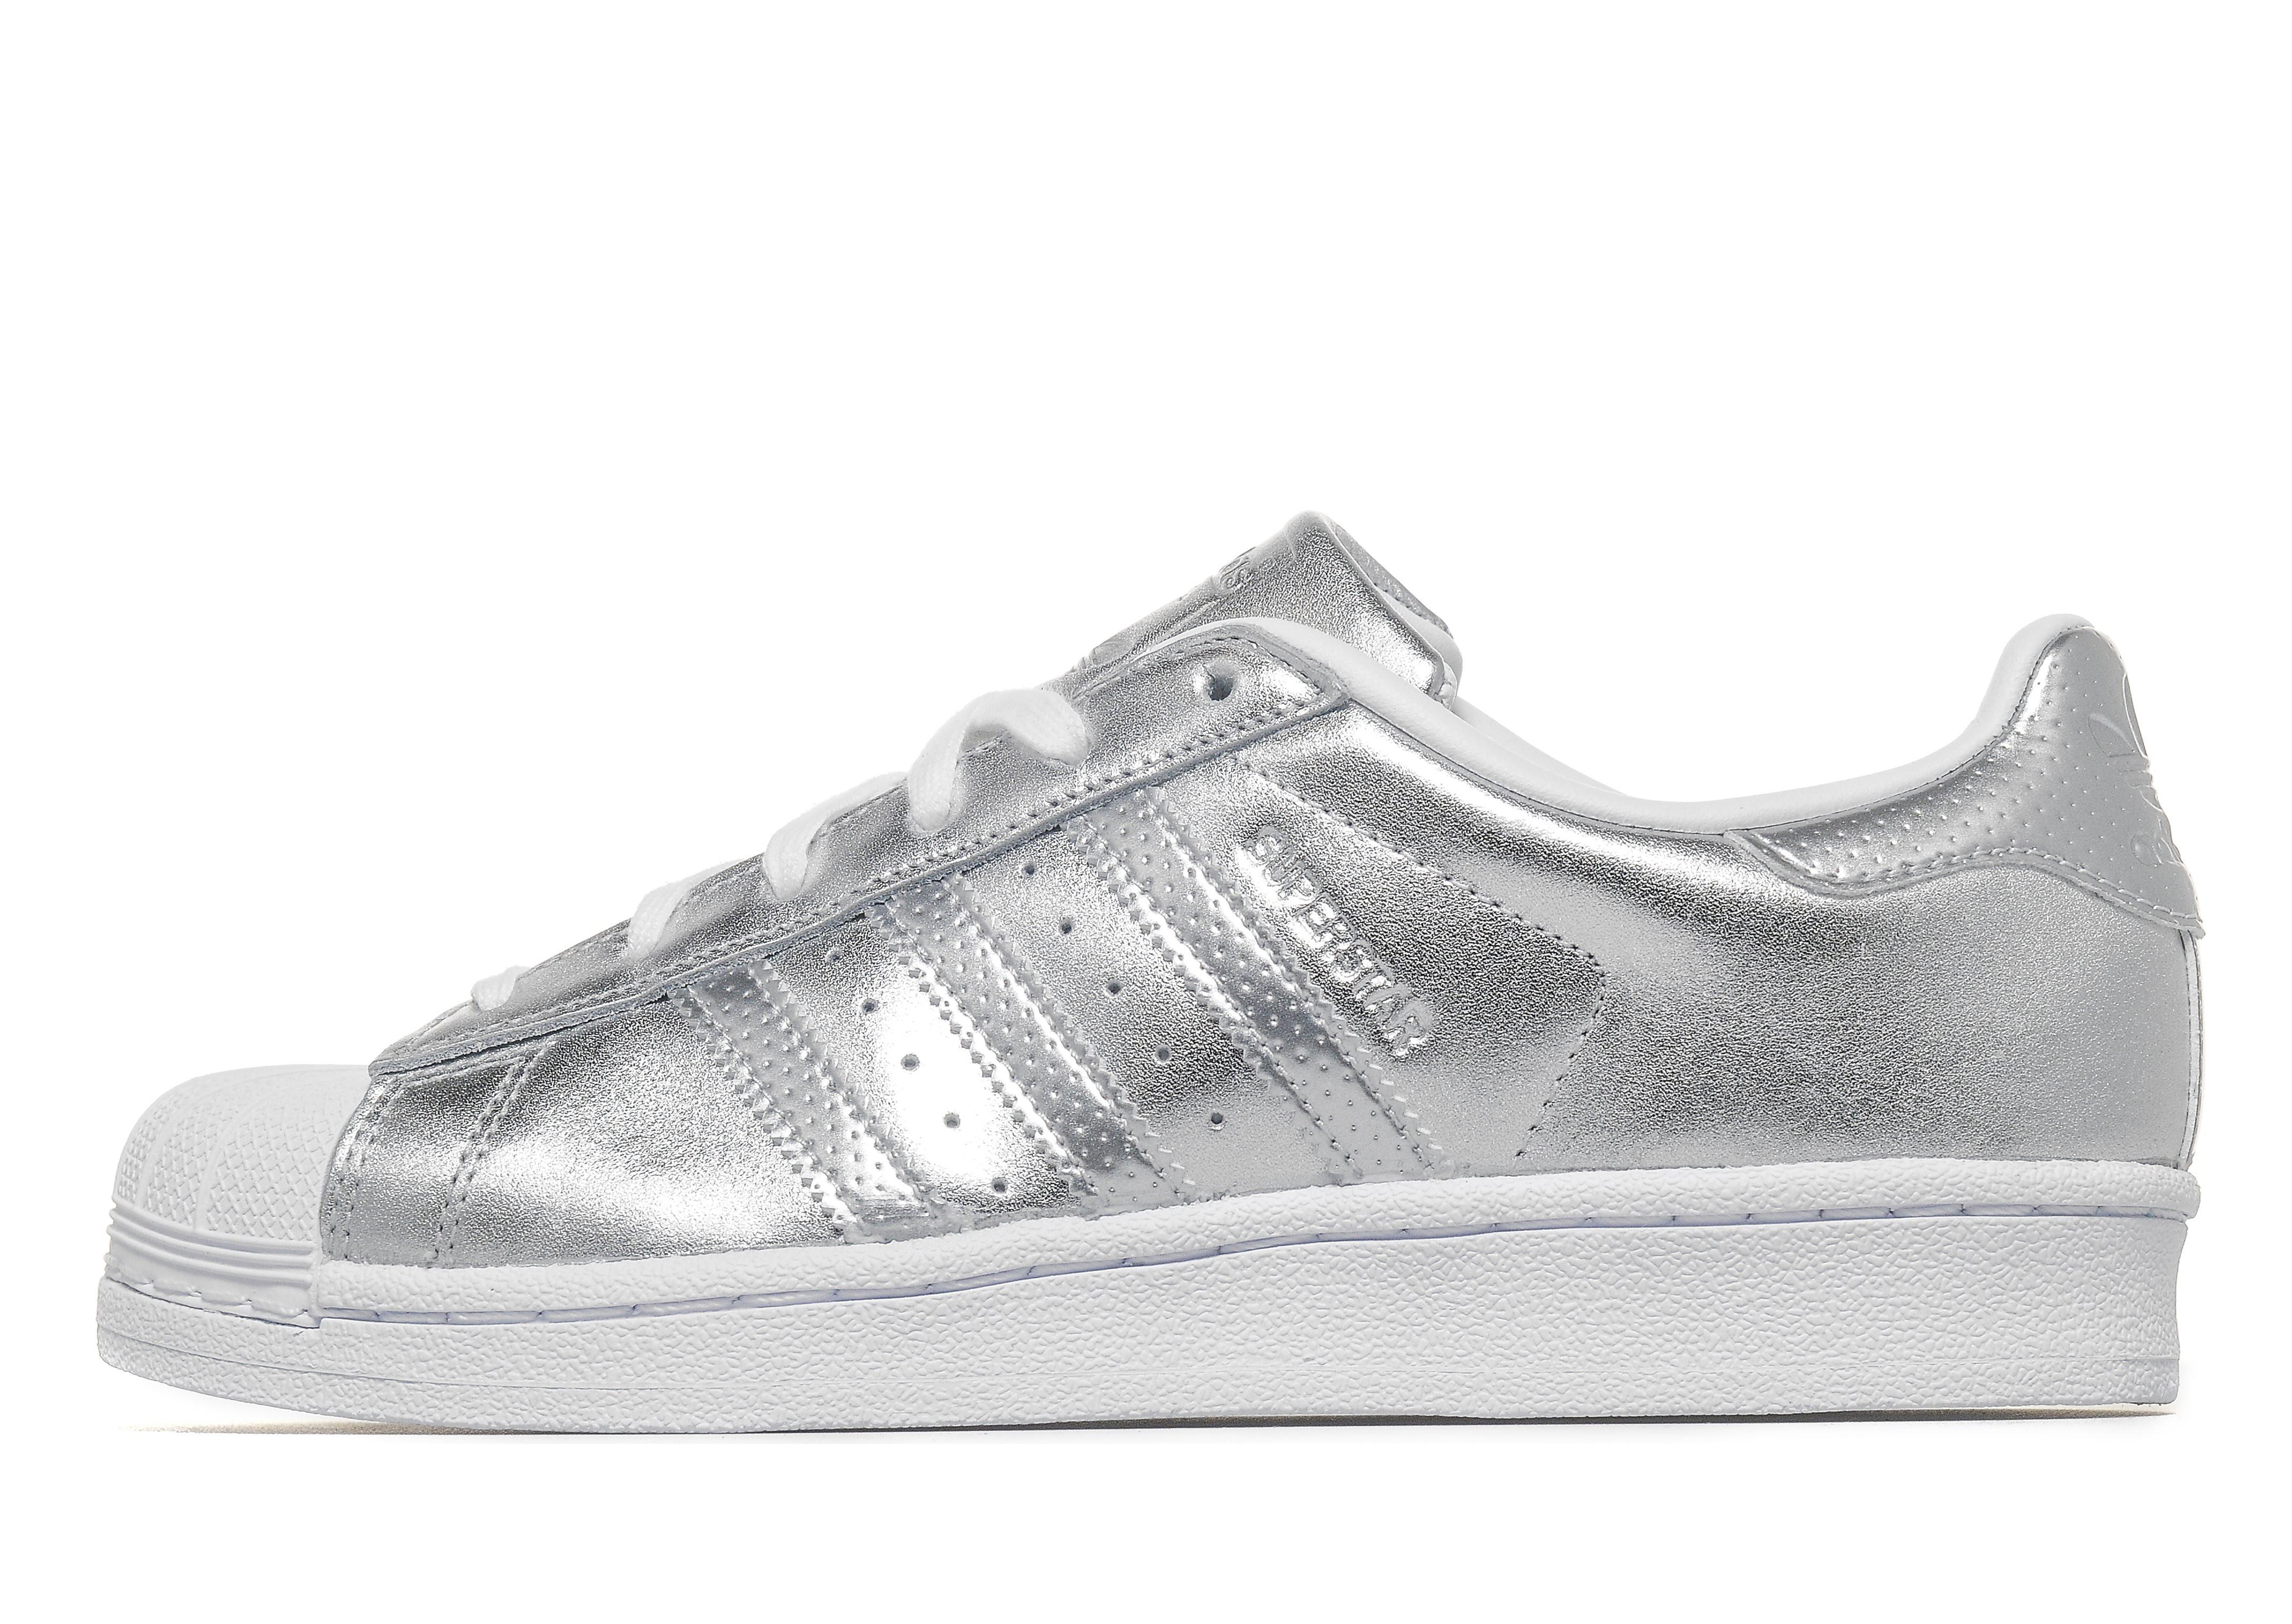 adidas Originals Superstar Perforated Women's